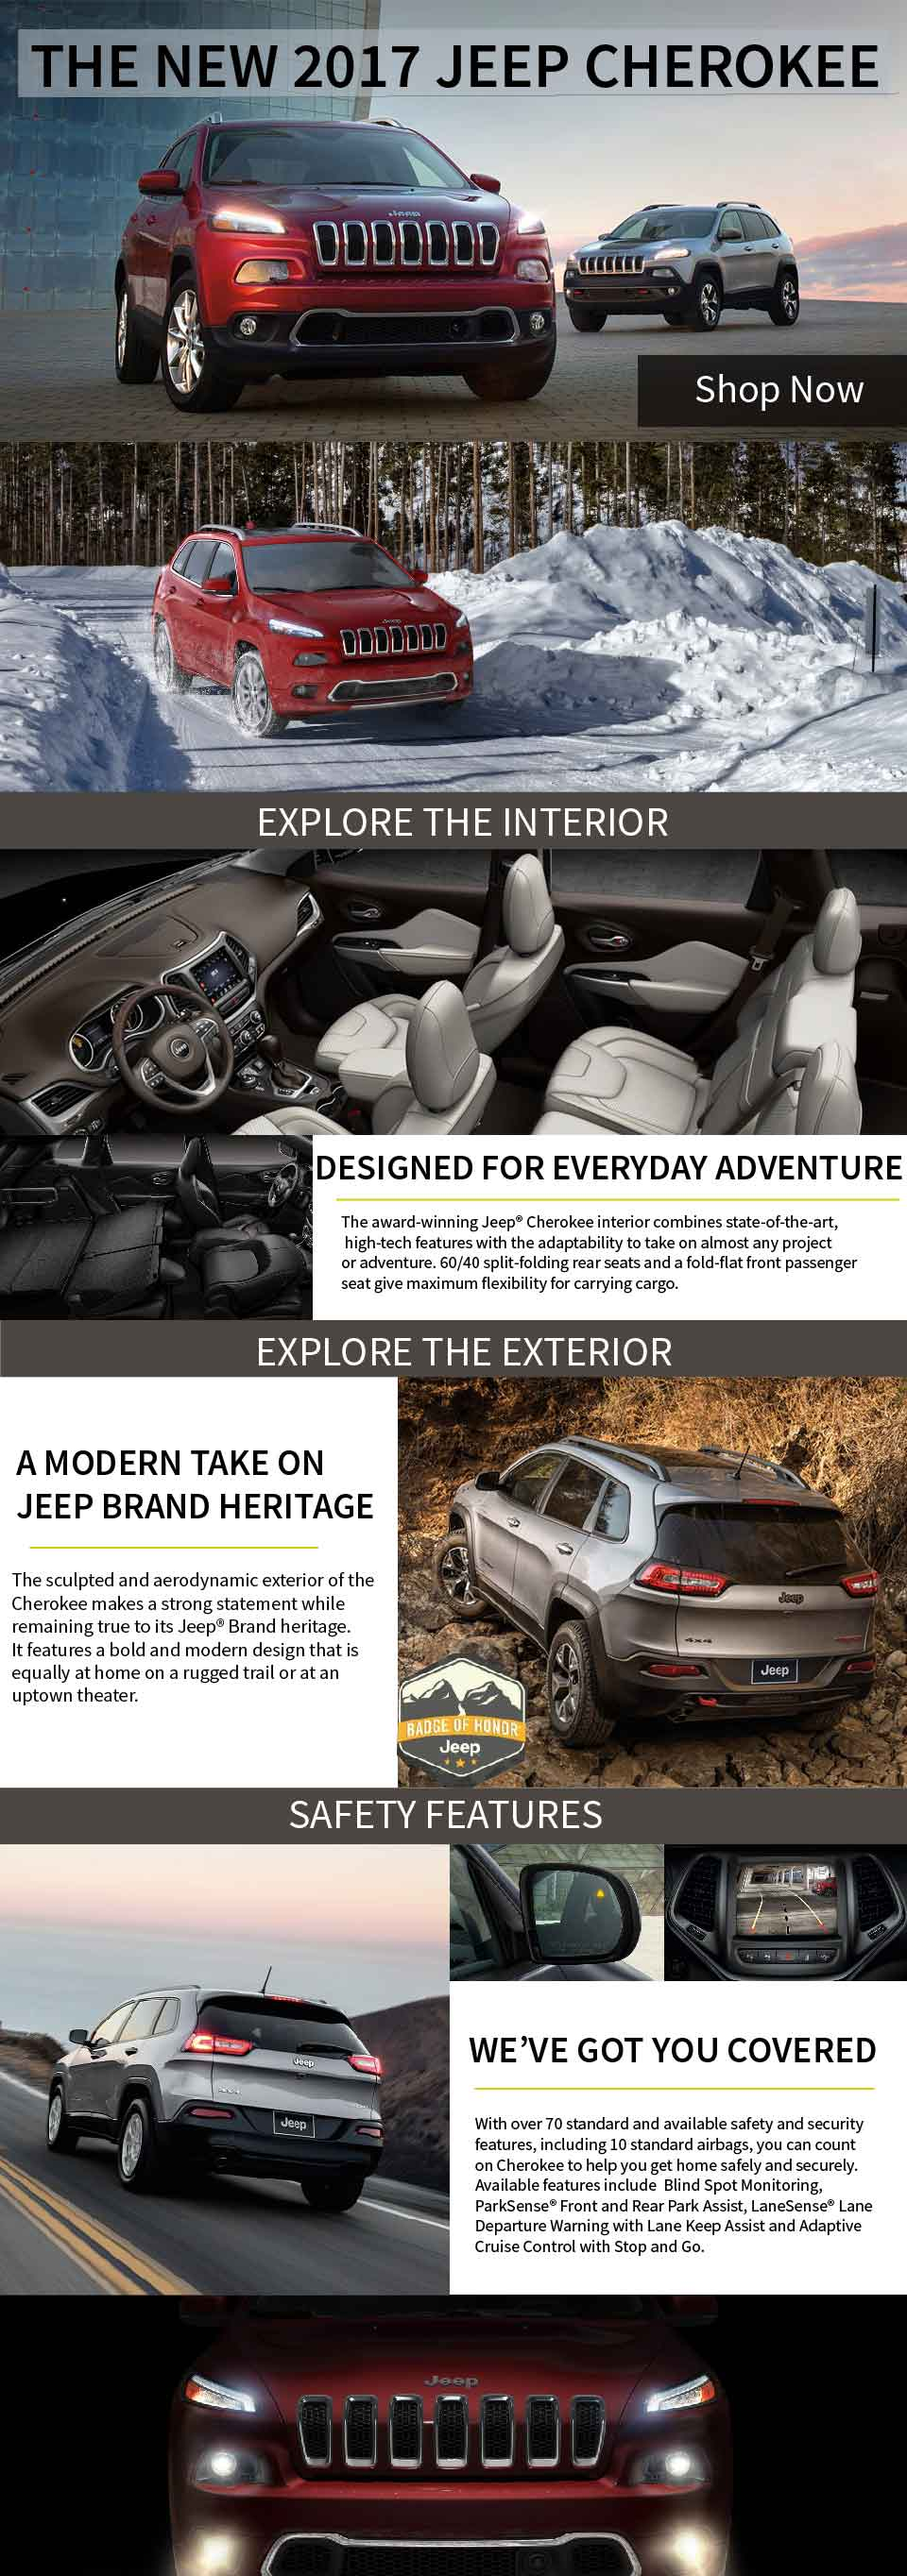 bob allen new dodge jeep fiat chrysler ram dealership in make an inquiry